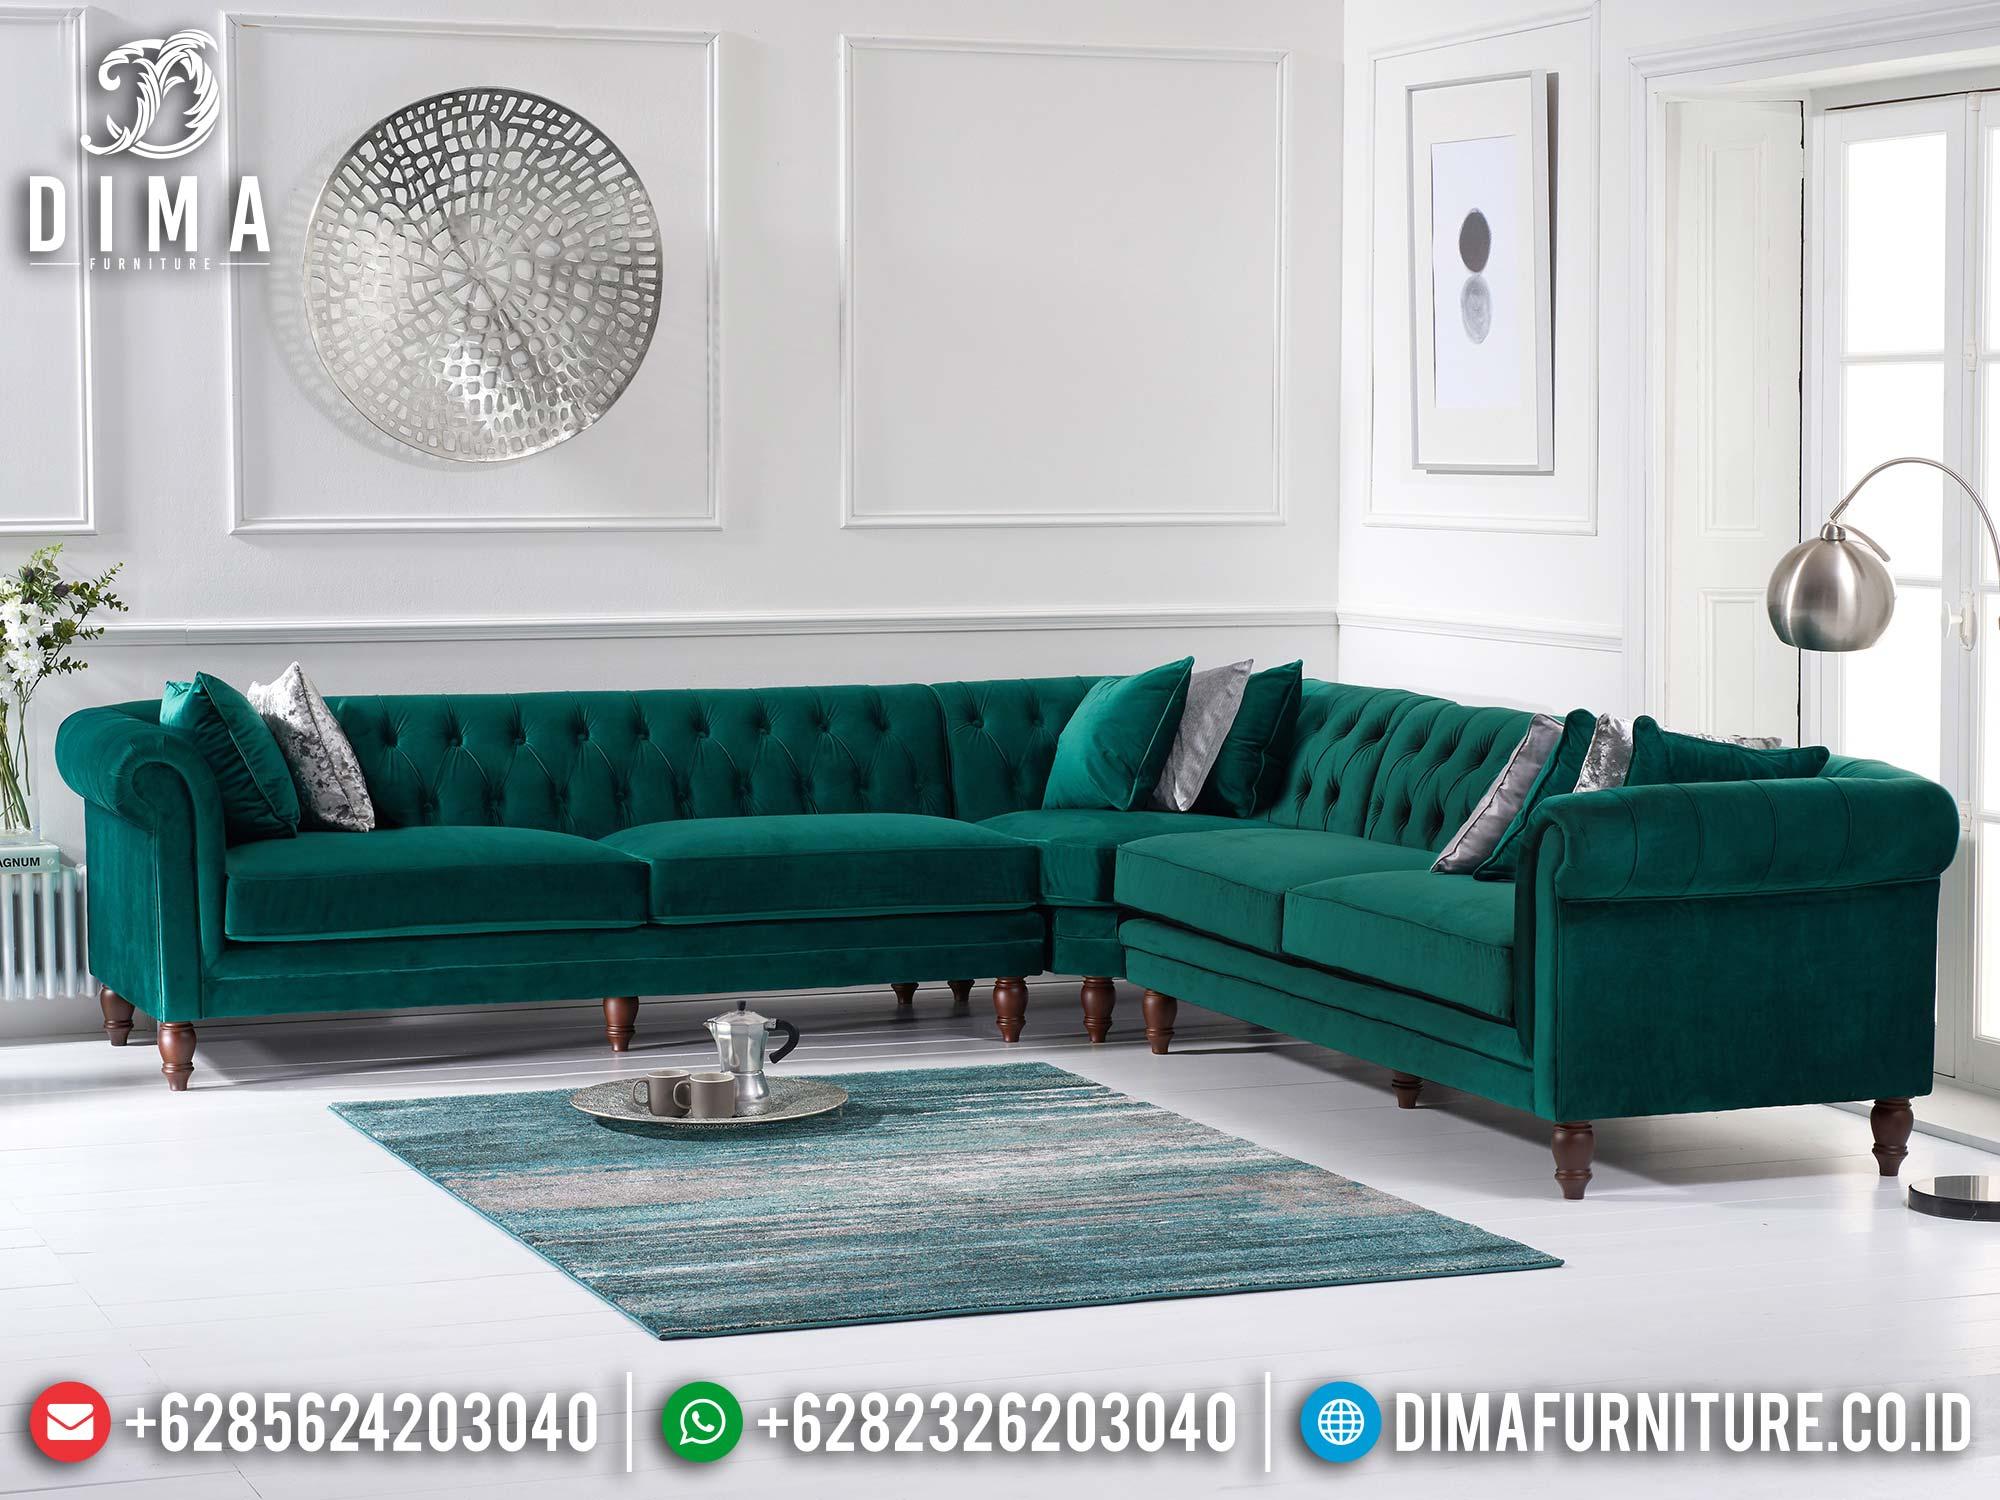 Tosca Green Sofa Tamu Minimalis Jepara Sudut L Terbaru Df-1419